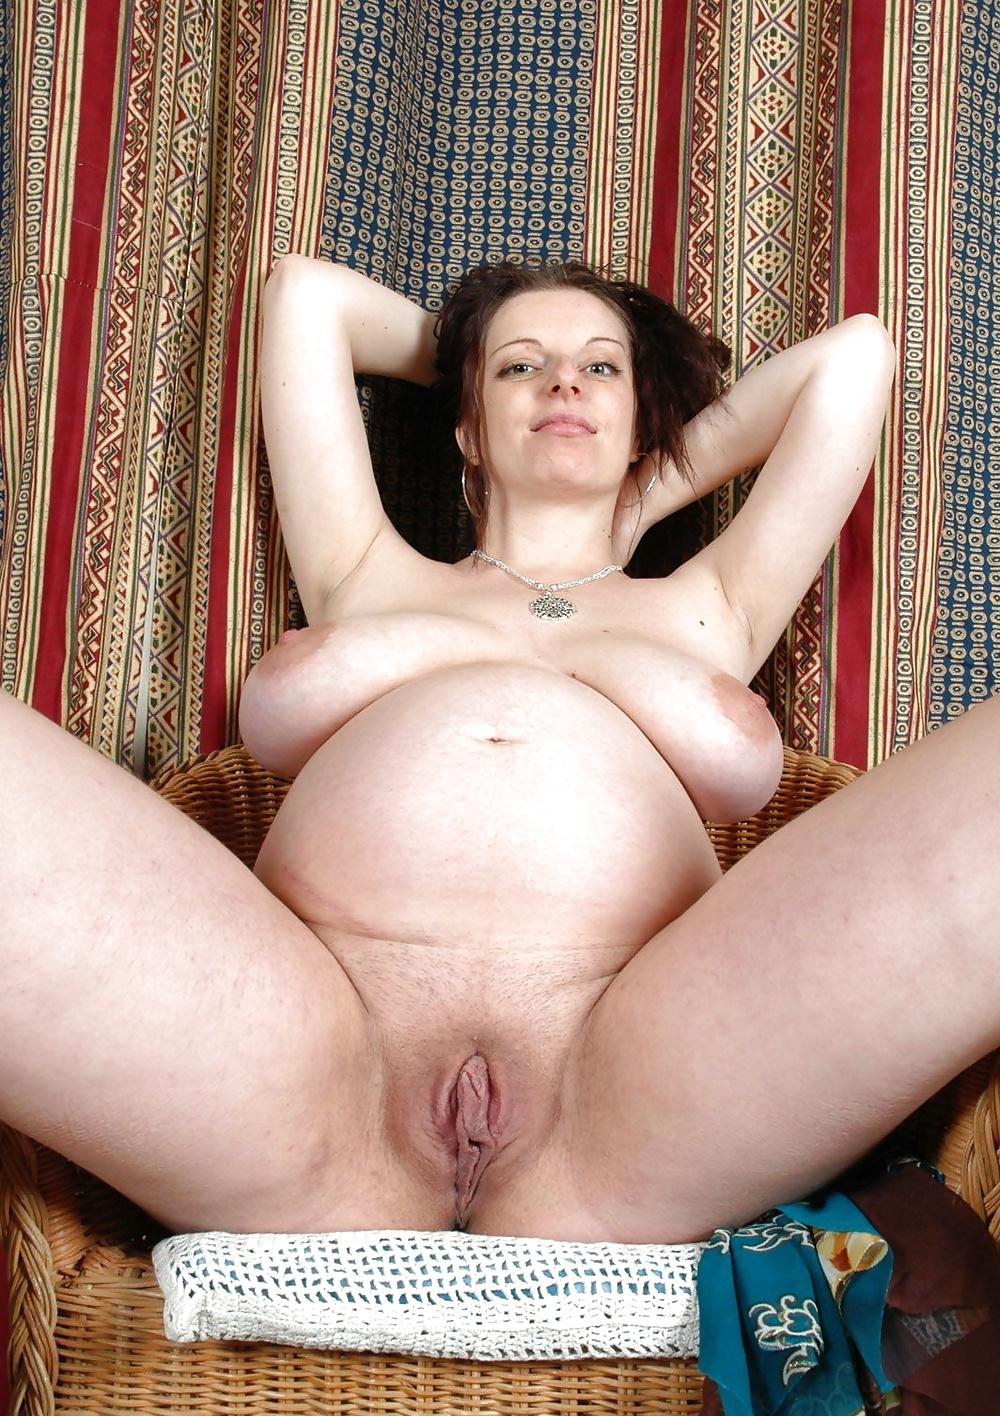 Nude Pregnant Women Breastfeeding